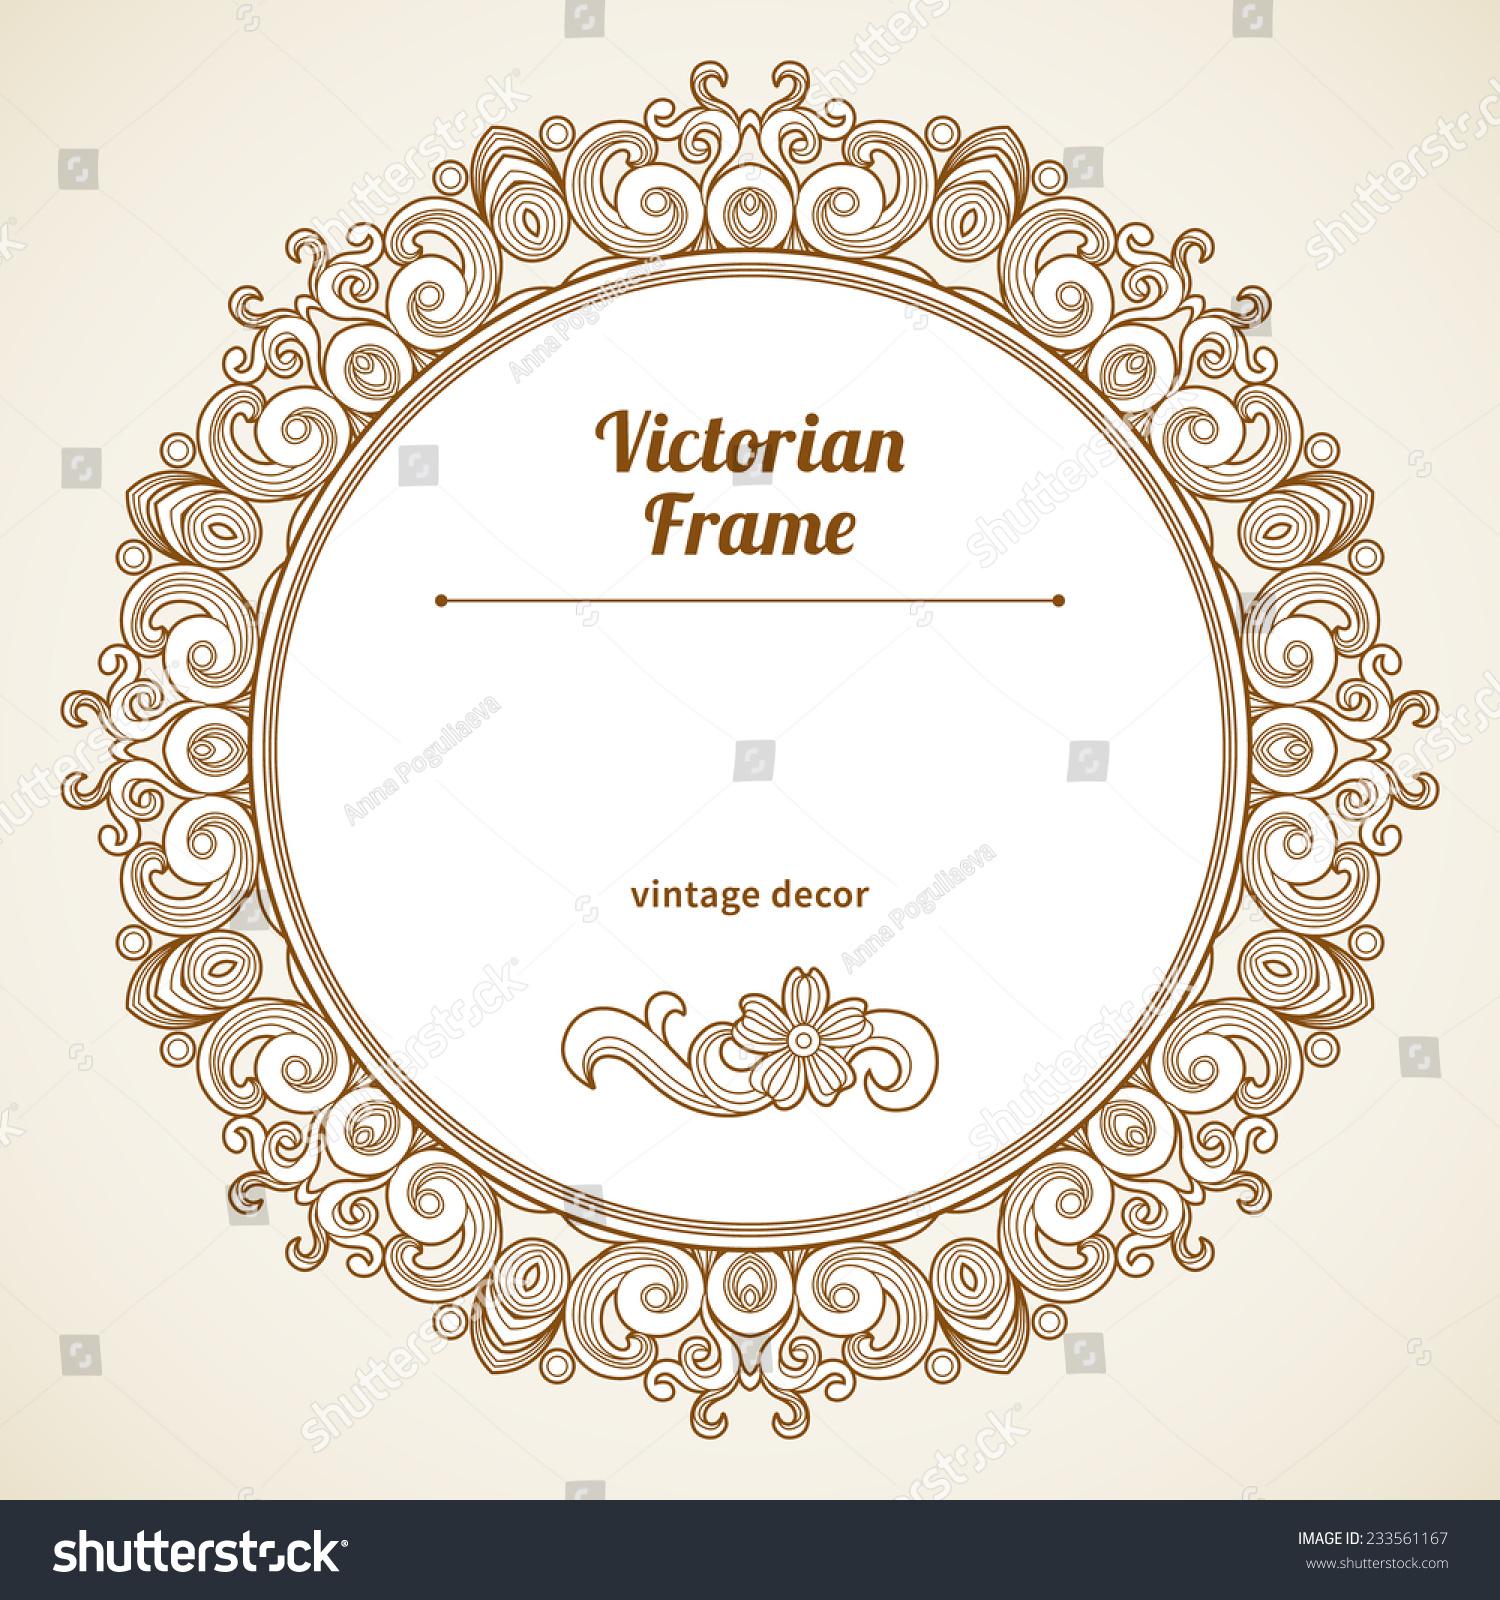 Victorian Circle Border - Bing images